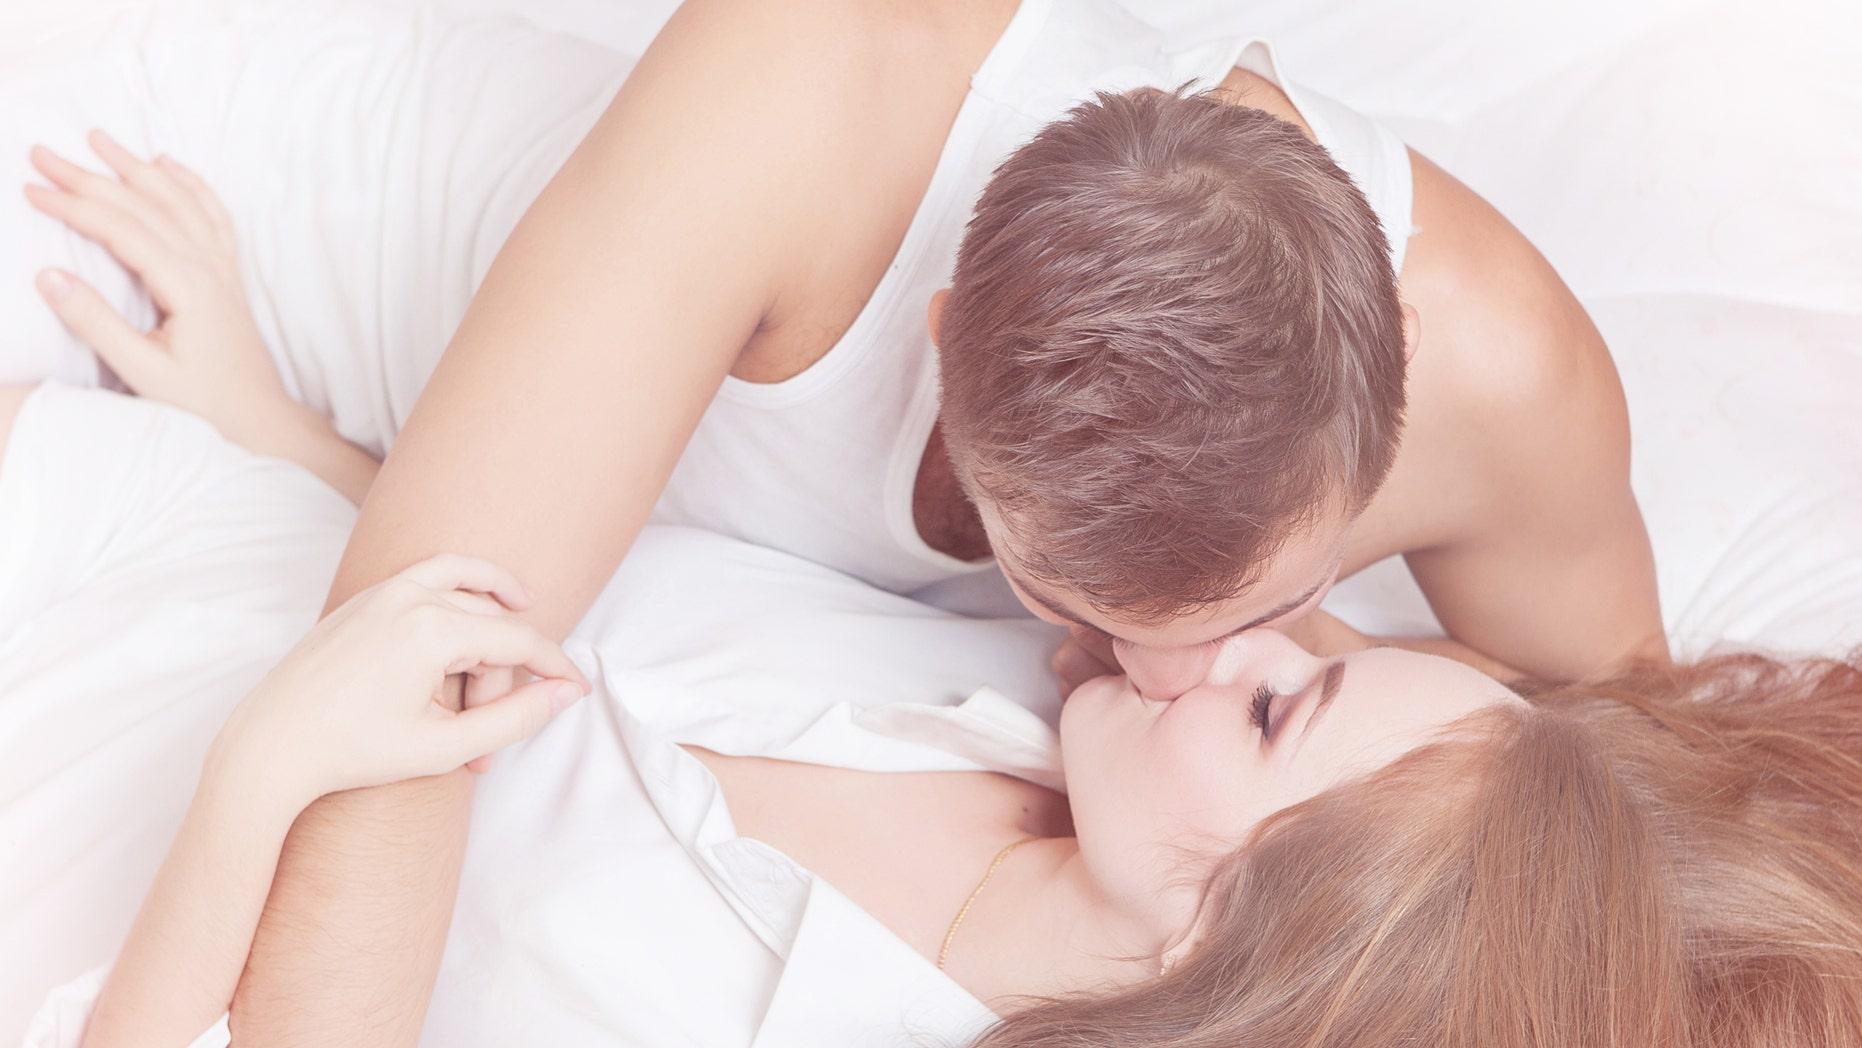 12 natural ways to improve fertility | Fox News